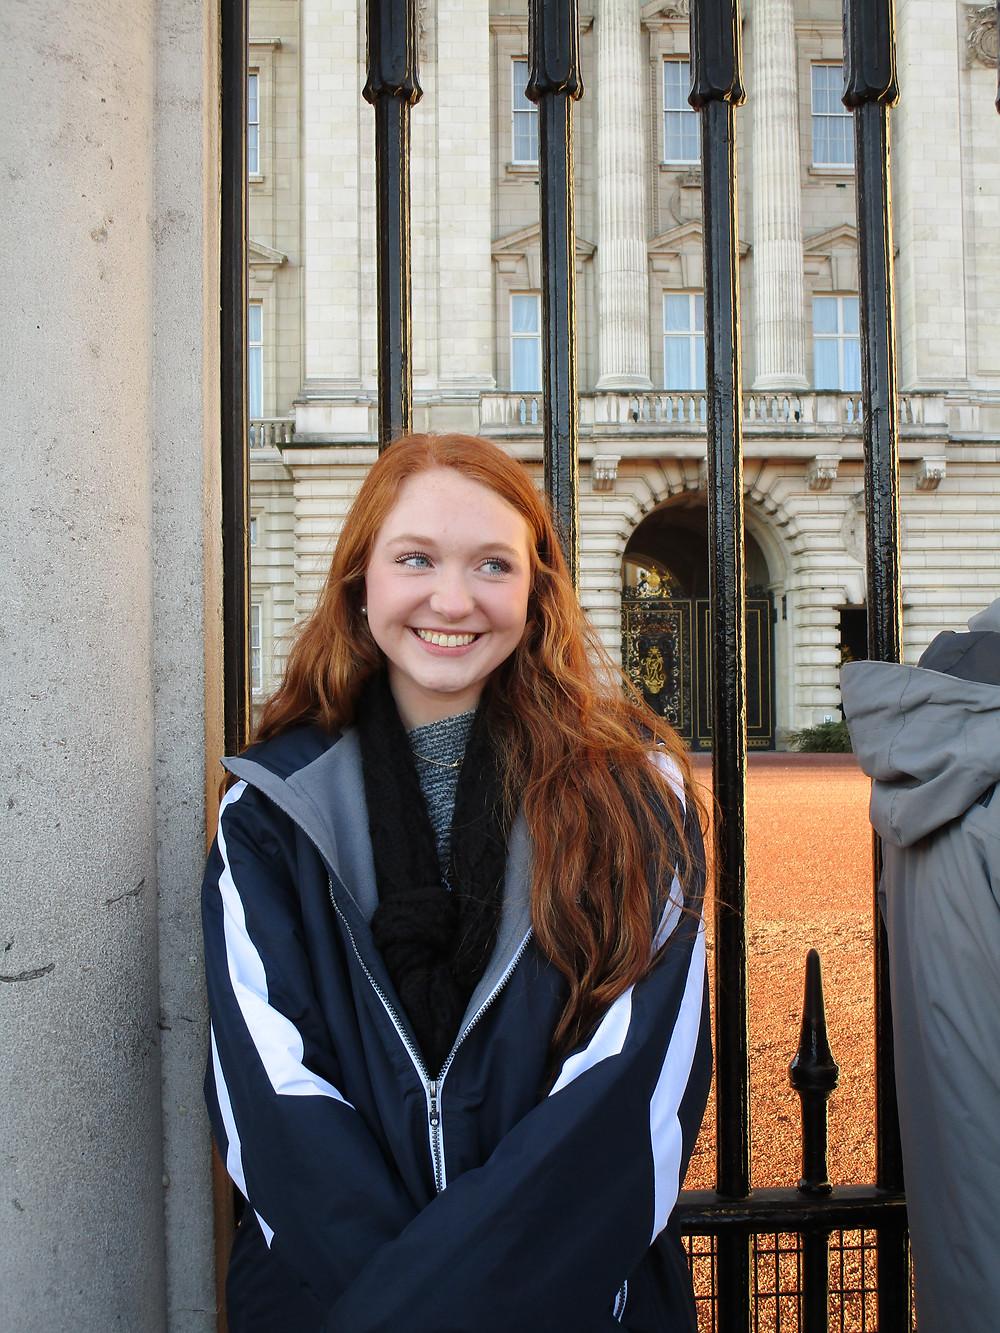 Betsy at Buckingham Palace